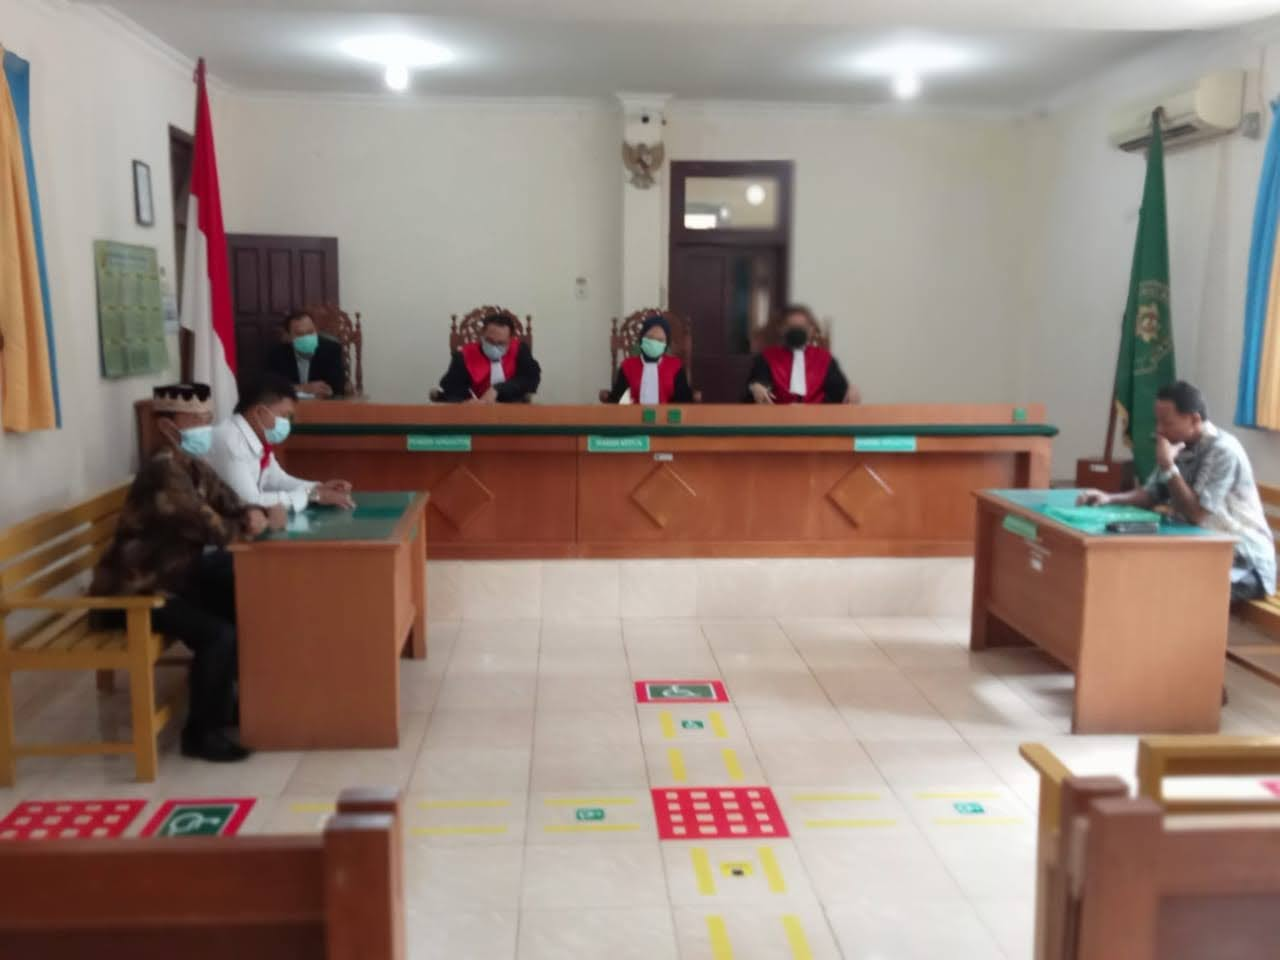 Sidang Perdata Money Politics Pekon Wonosari Kecamatan Gadingrejo Di Tunda